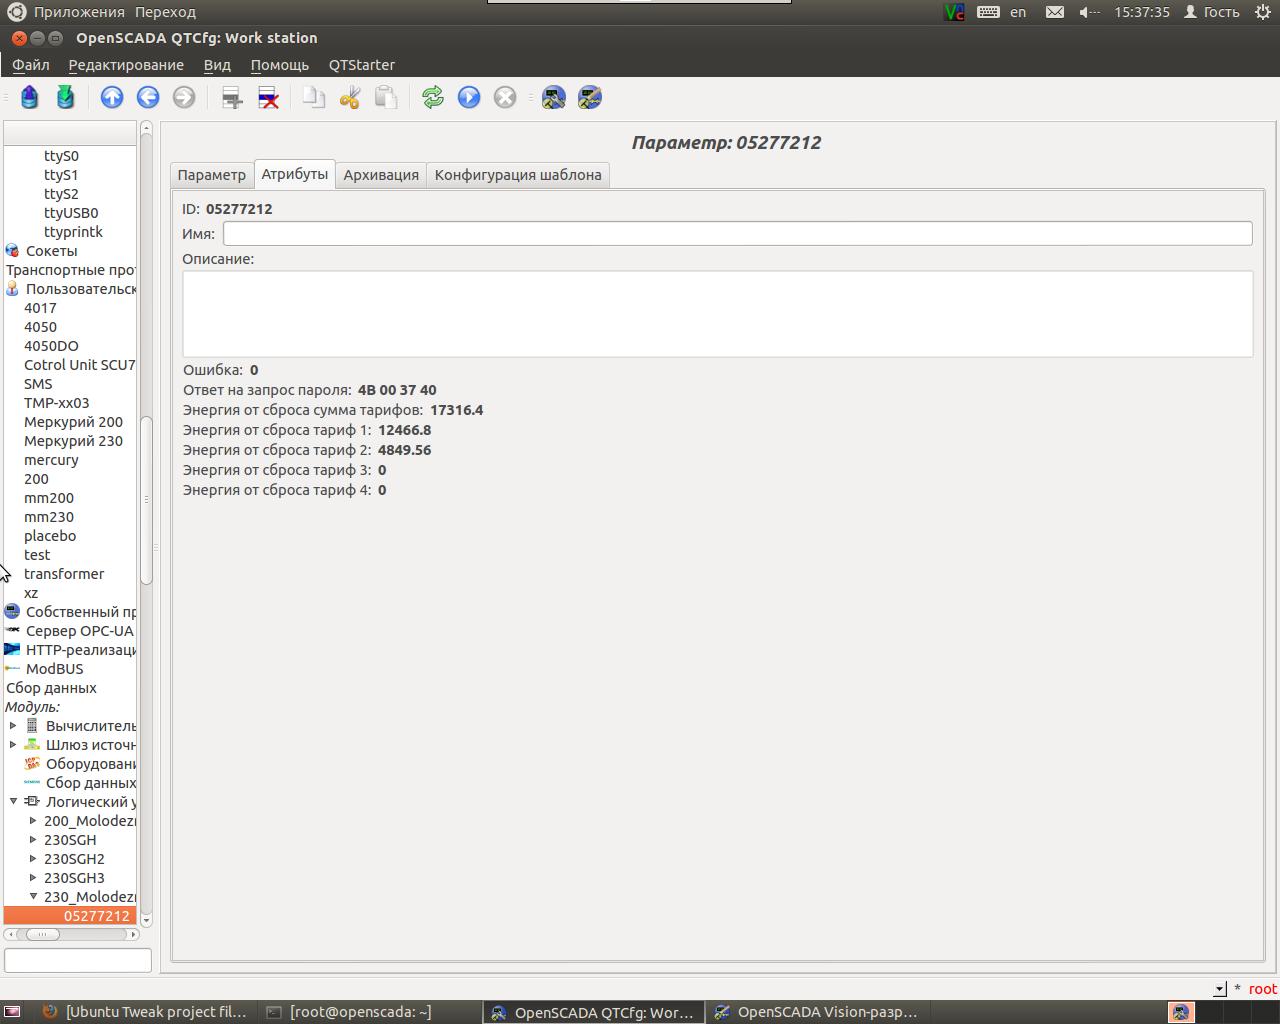 Пишем протоколы счетчиков Меркурий 230 и Меркурий 200 для OpenSCADA - 14